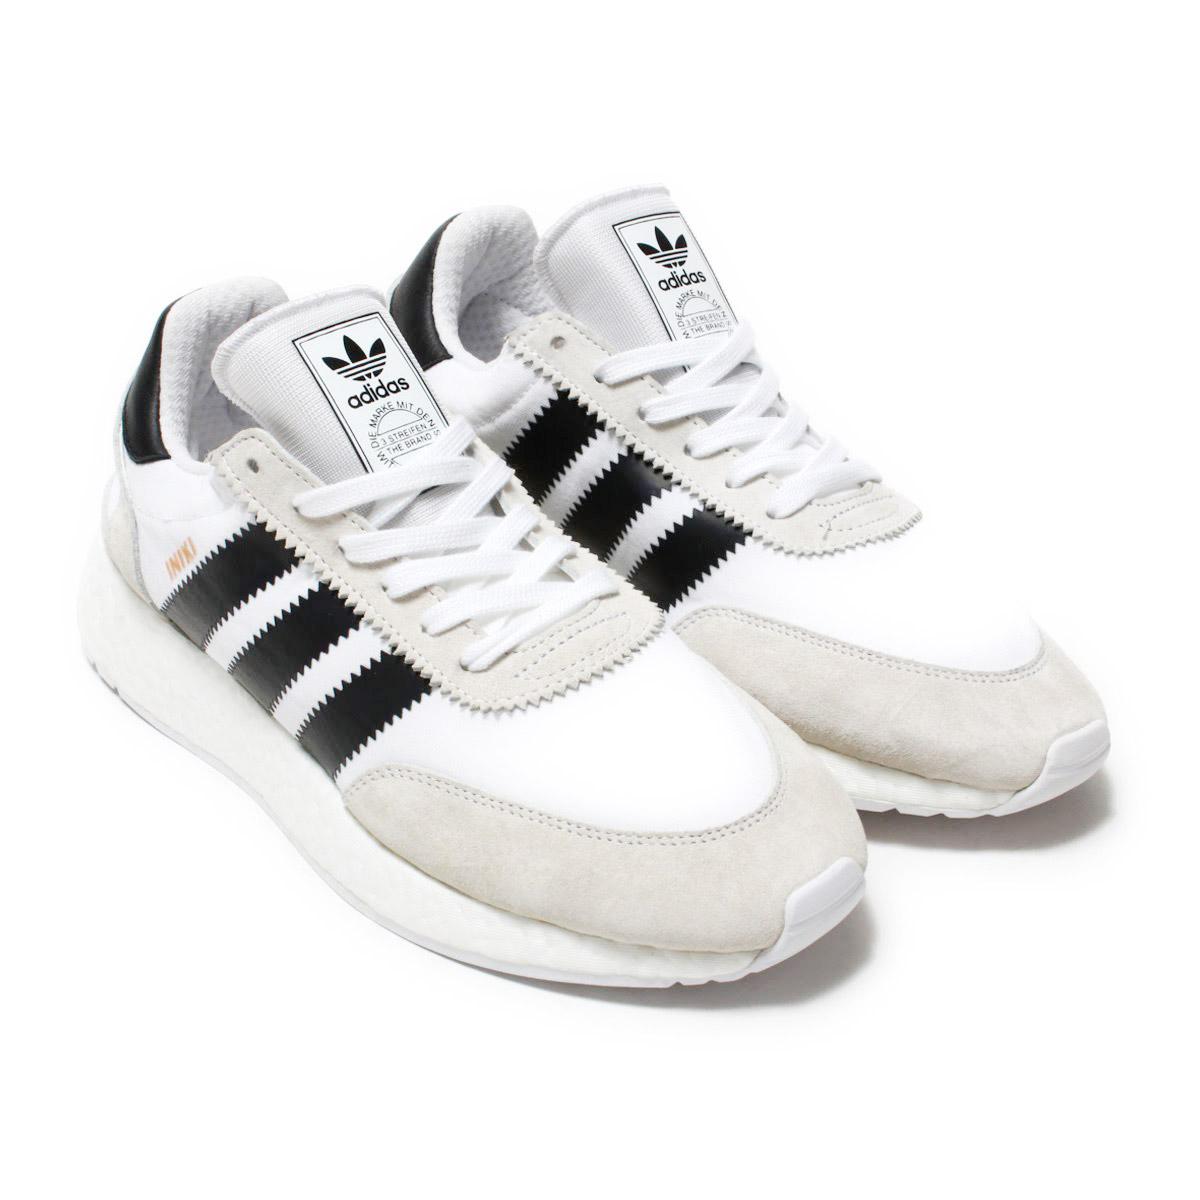 adidas Originals I-5923(アディダス オリジナルス イニキ ランナー) Running White/Core Black/Copper Met18SS-I